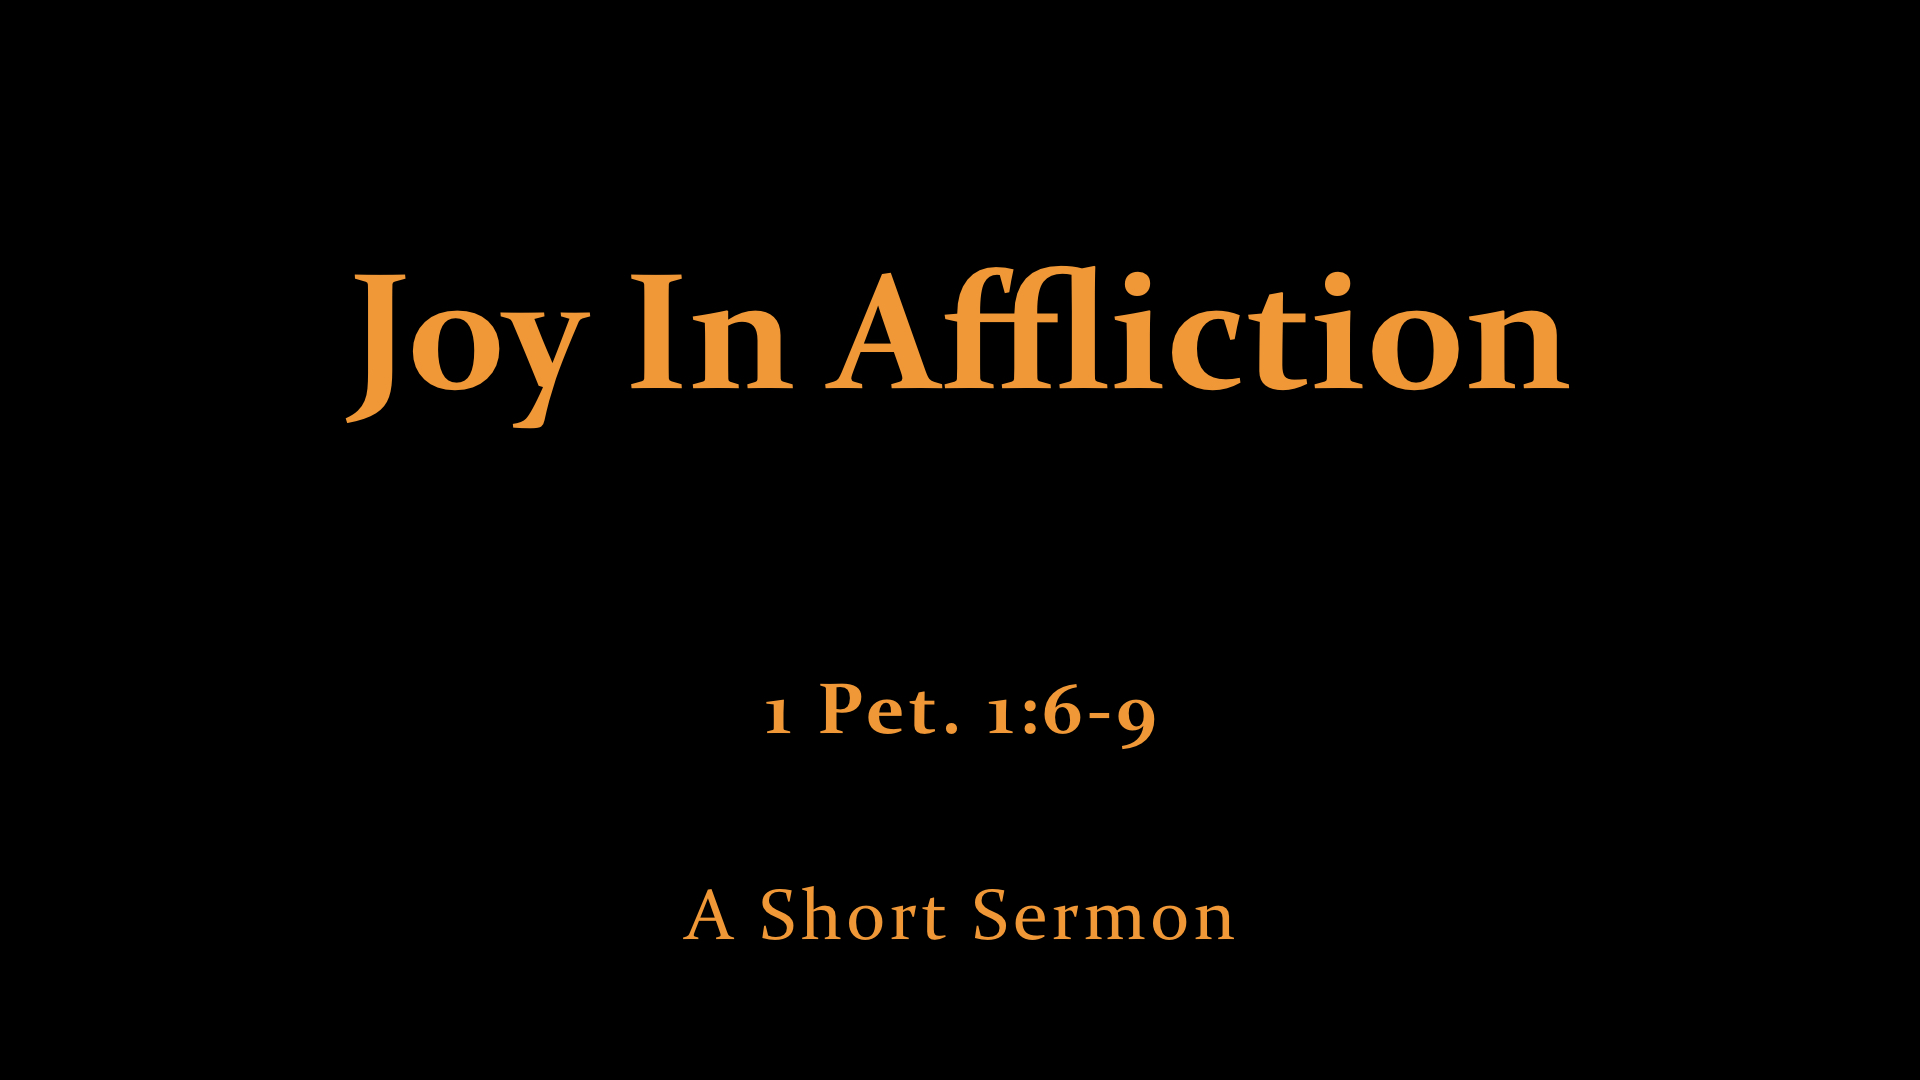 1 Pet. 1;6-9 Joy In Affliction.jpeg